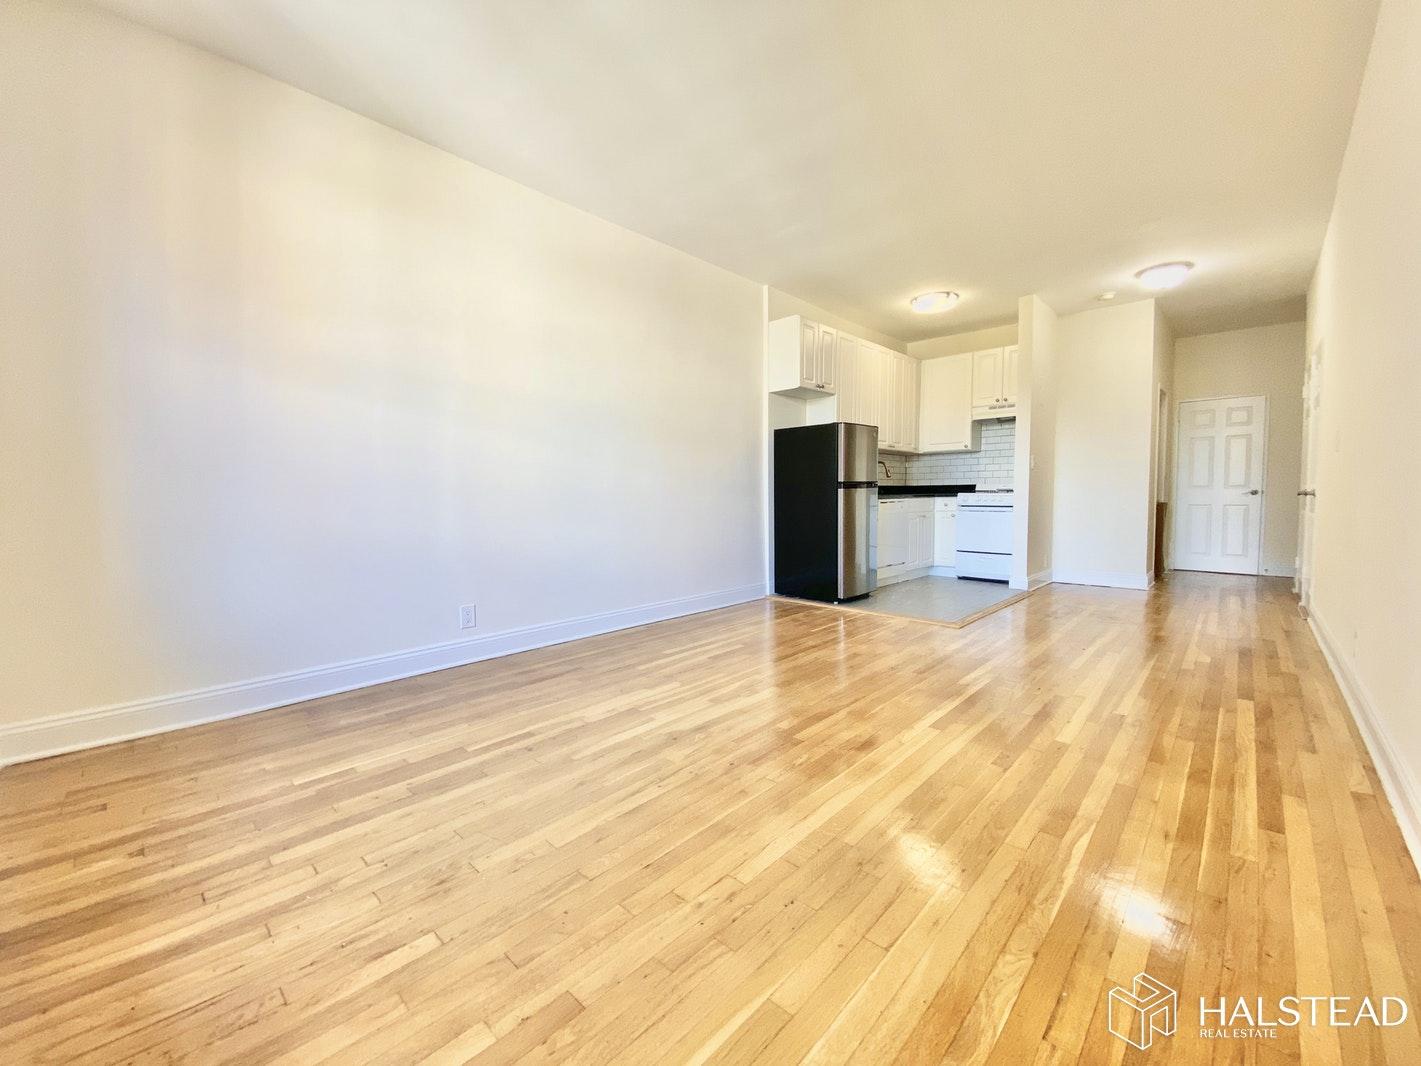 534 EAST 88TH STREET, Upper East Side, $2,600, Web #: 19913877